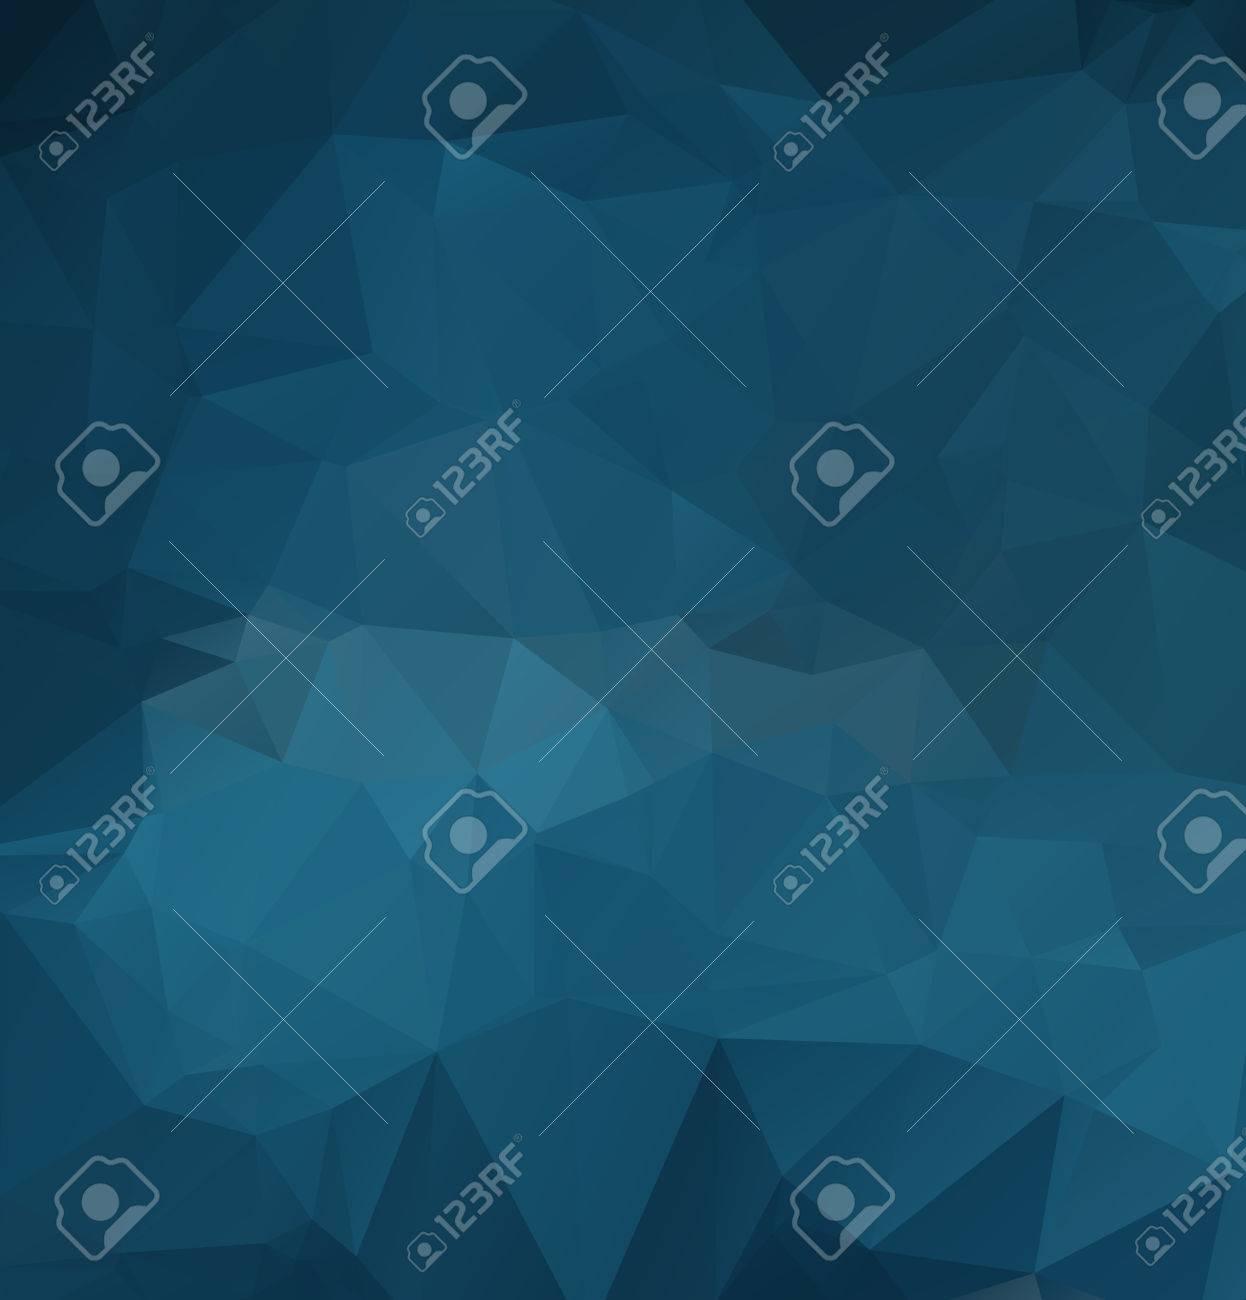 polygonal triangular modern design background - 54856135